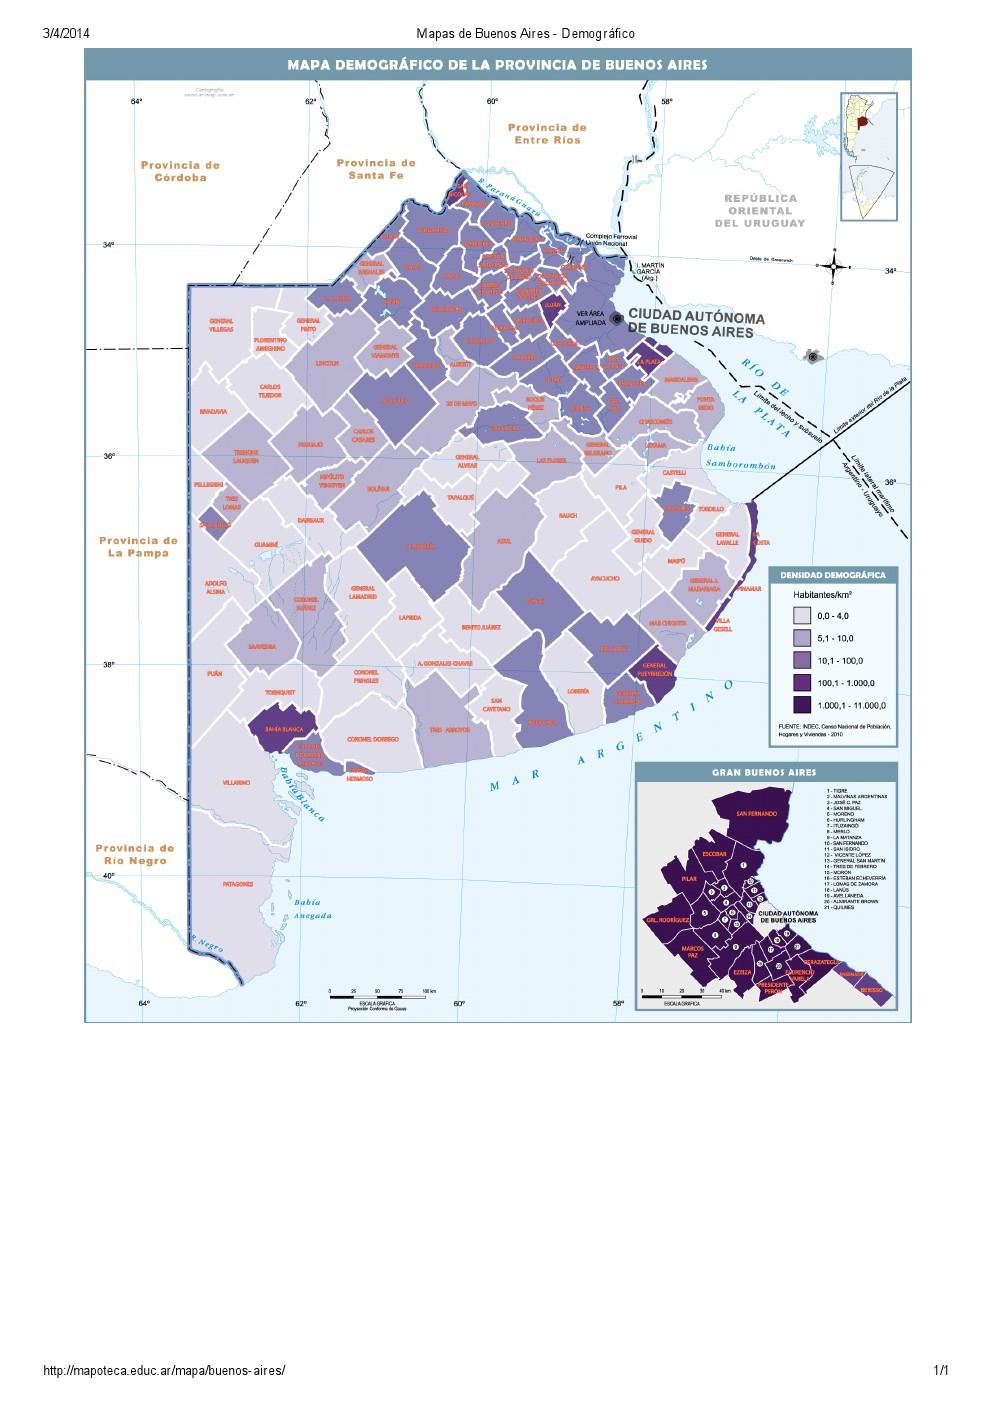 Mapa demográfico de Buenos Aires. Mapoteca de Educ.ar